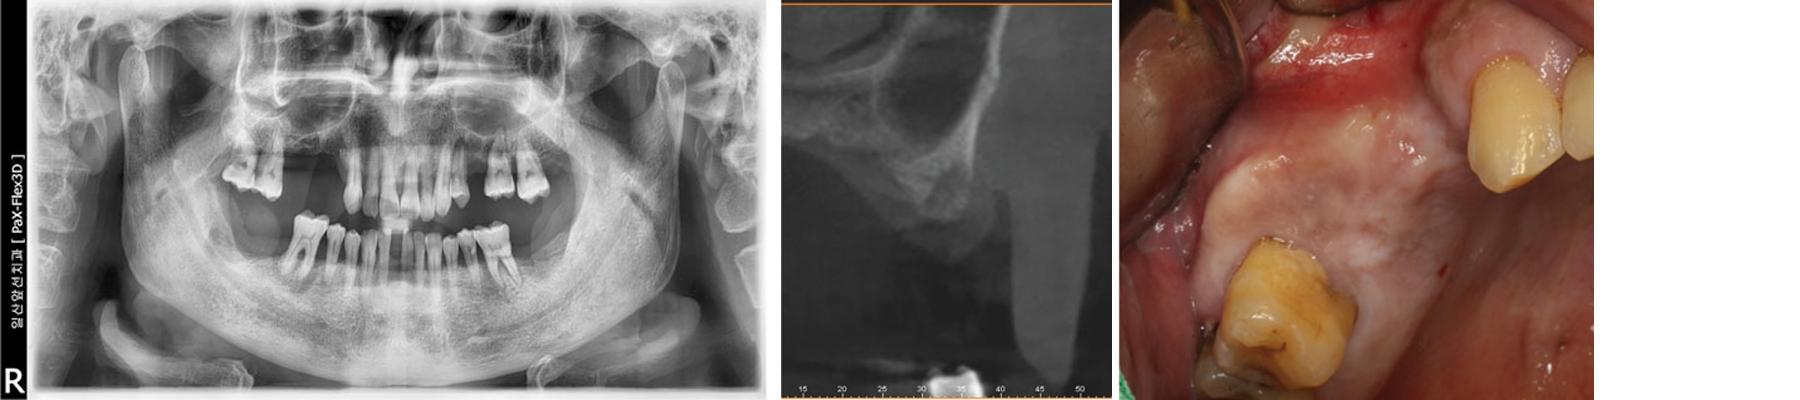 Pre-operative radiograph & Intra-oral view